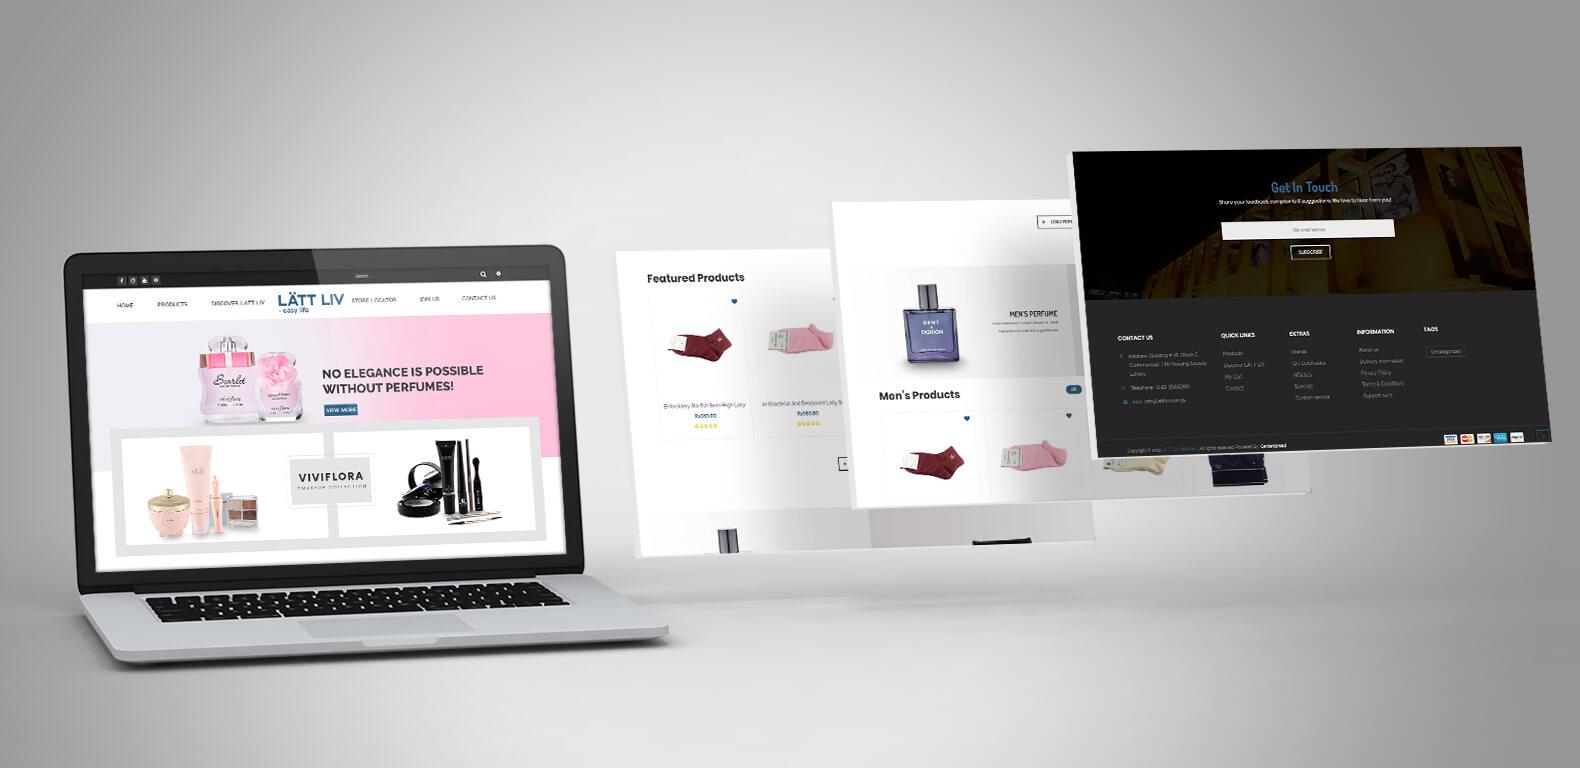 Website-product-page-lattliv-Pakistan